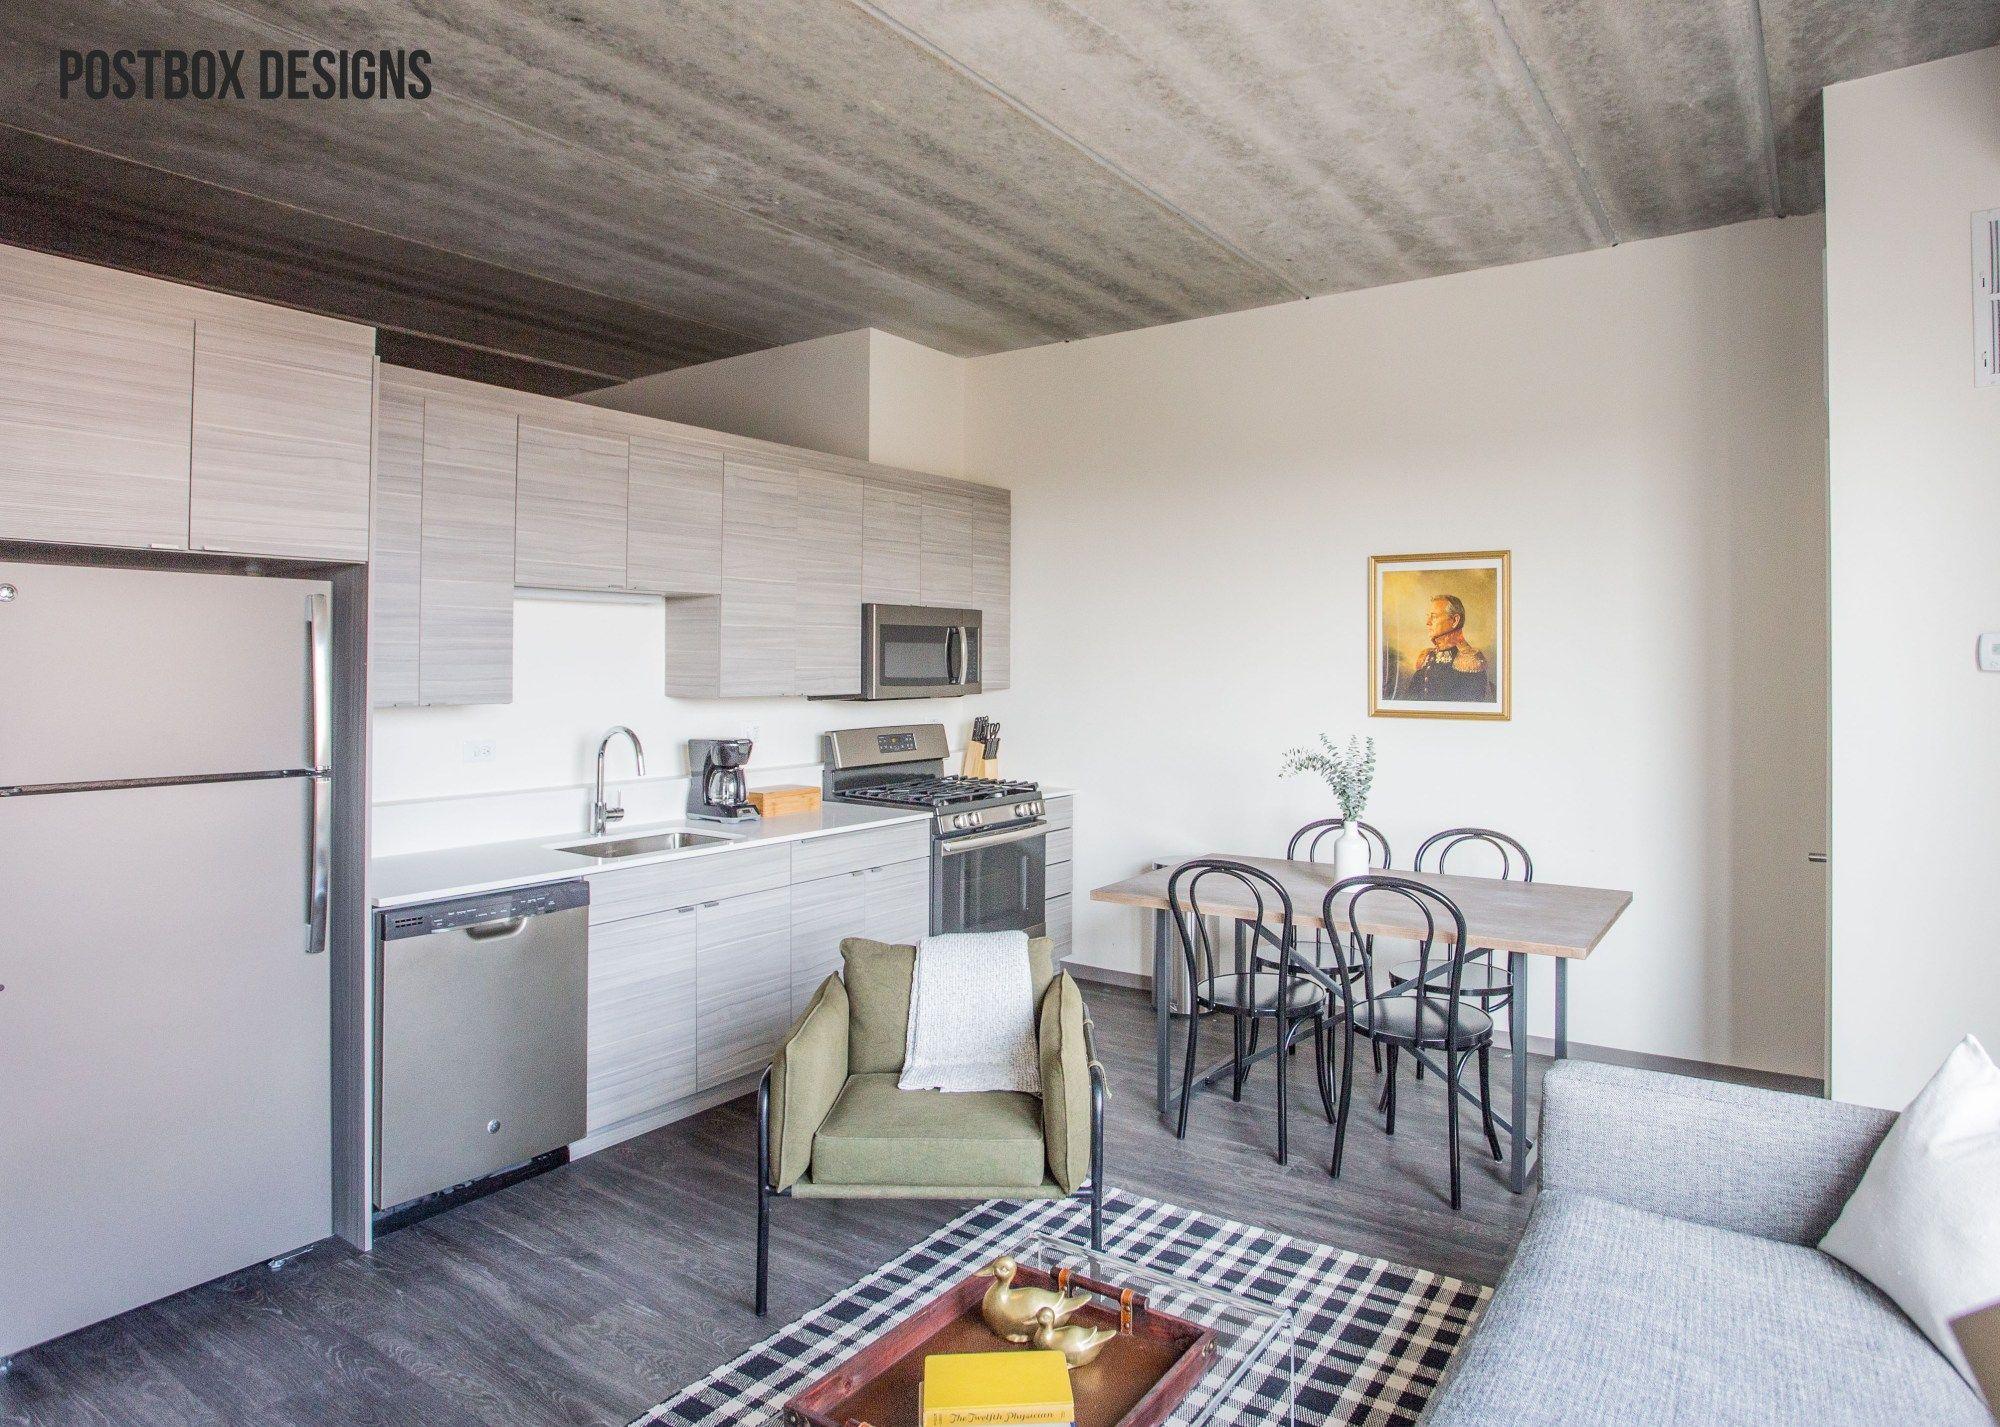 Postbox Designs: Modern Boho Living Room Kitchen Dining Room Loft via Online Interior Design for Sonder Stays #interiordesignonline & Postbox Designs: Modern Boho Living Room Kitchen Dining Room Loft ...